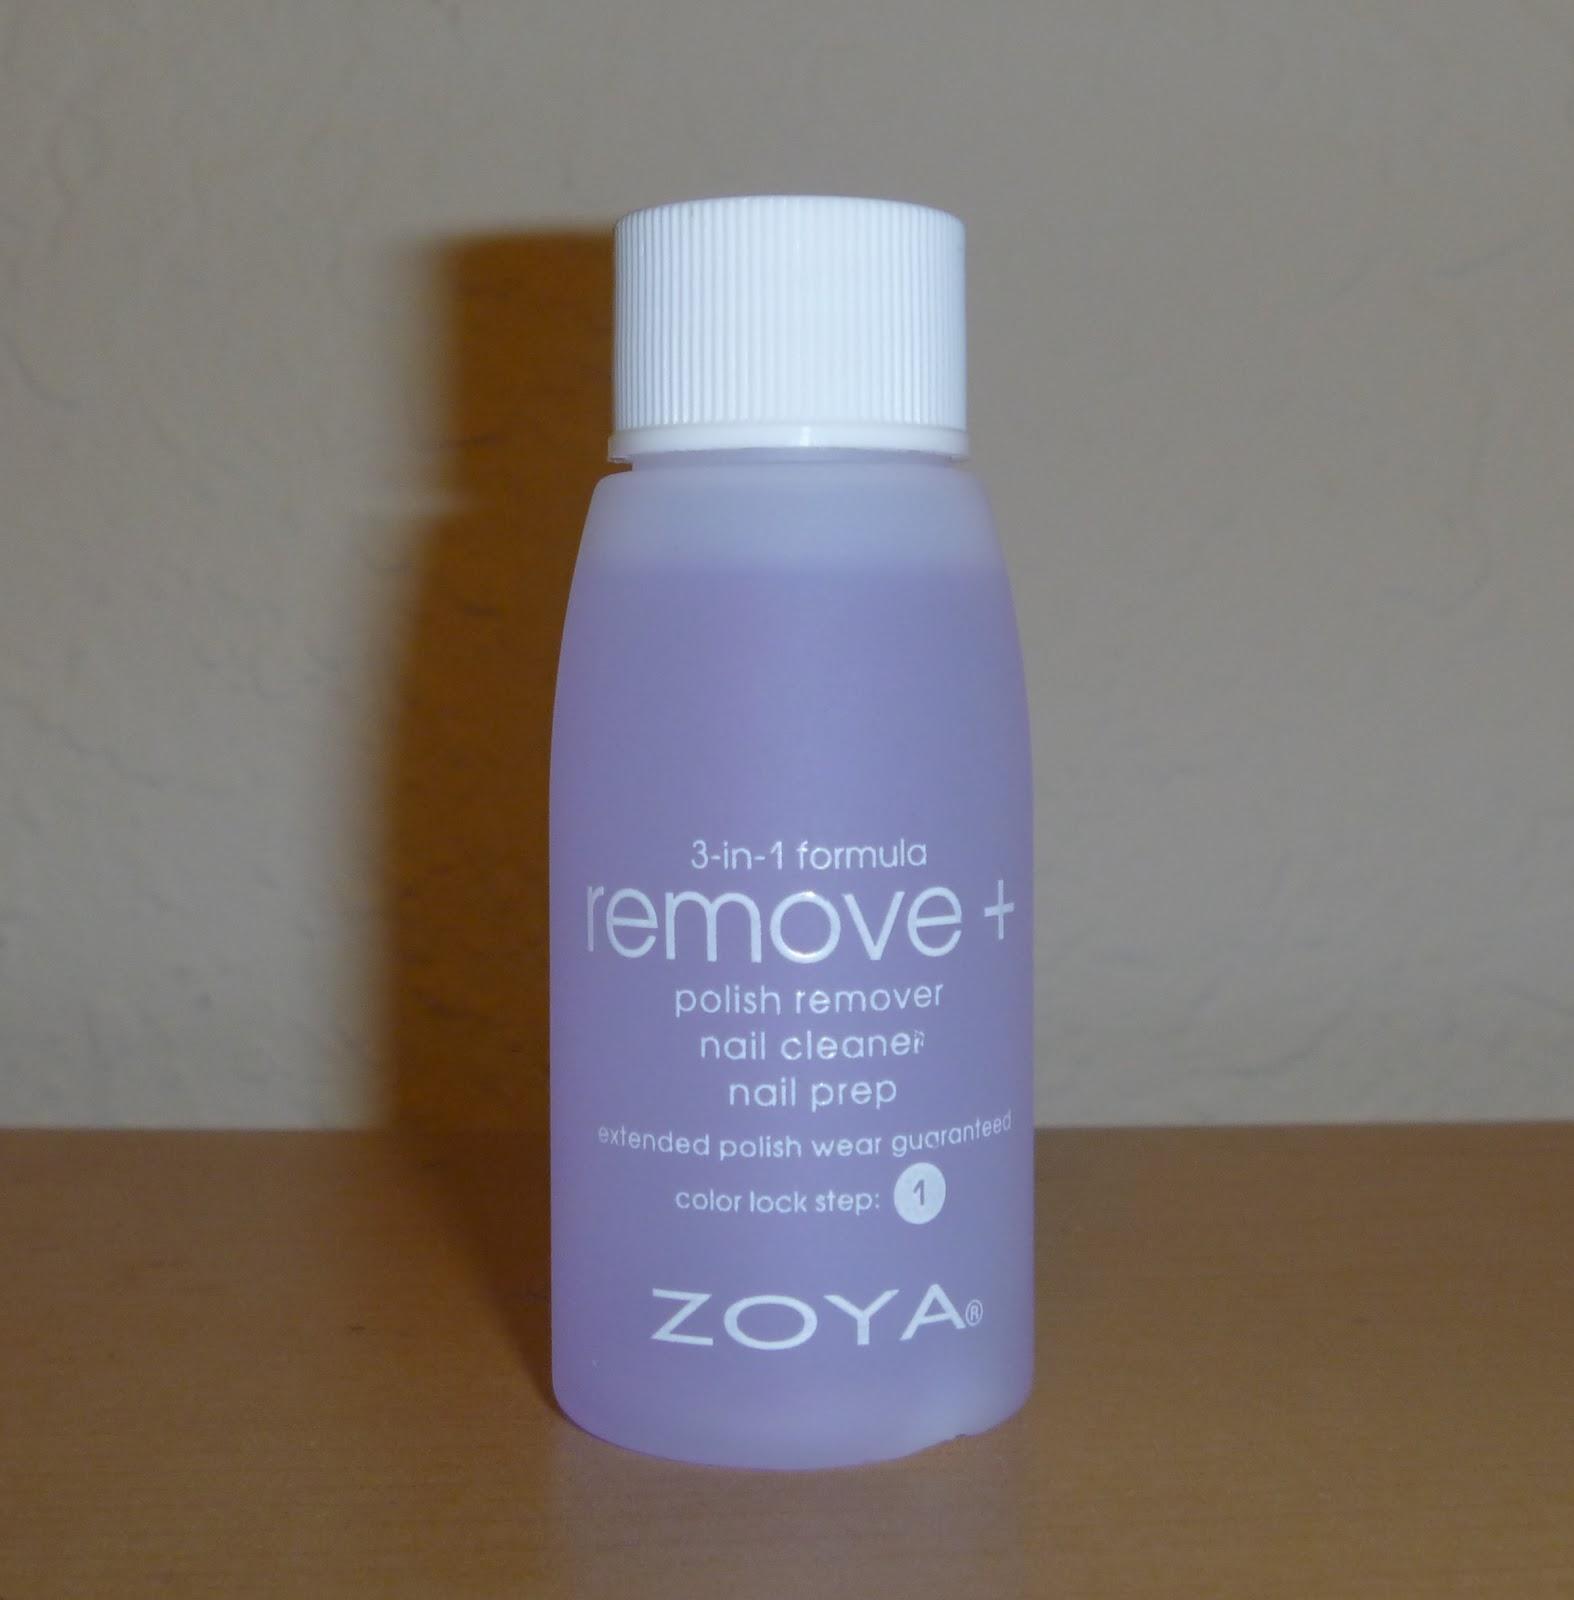 ColourVida: Zoya Remove Plus Nail Polish Remover Review